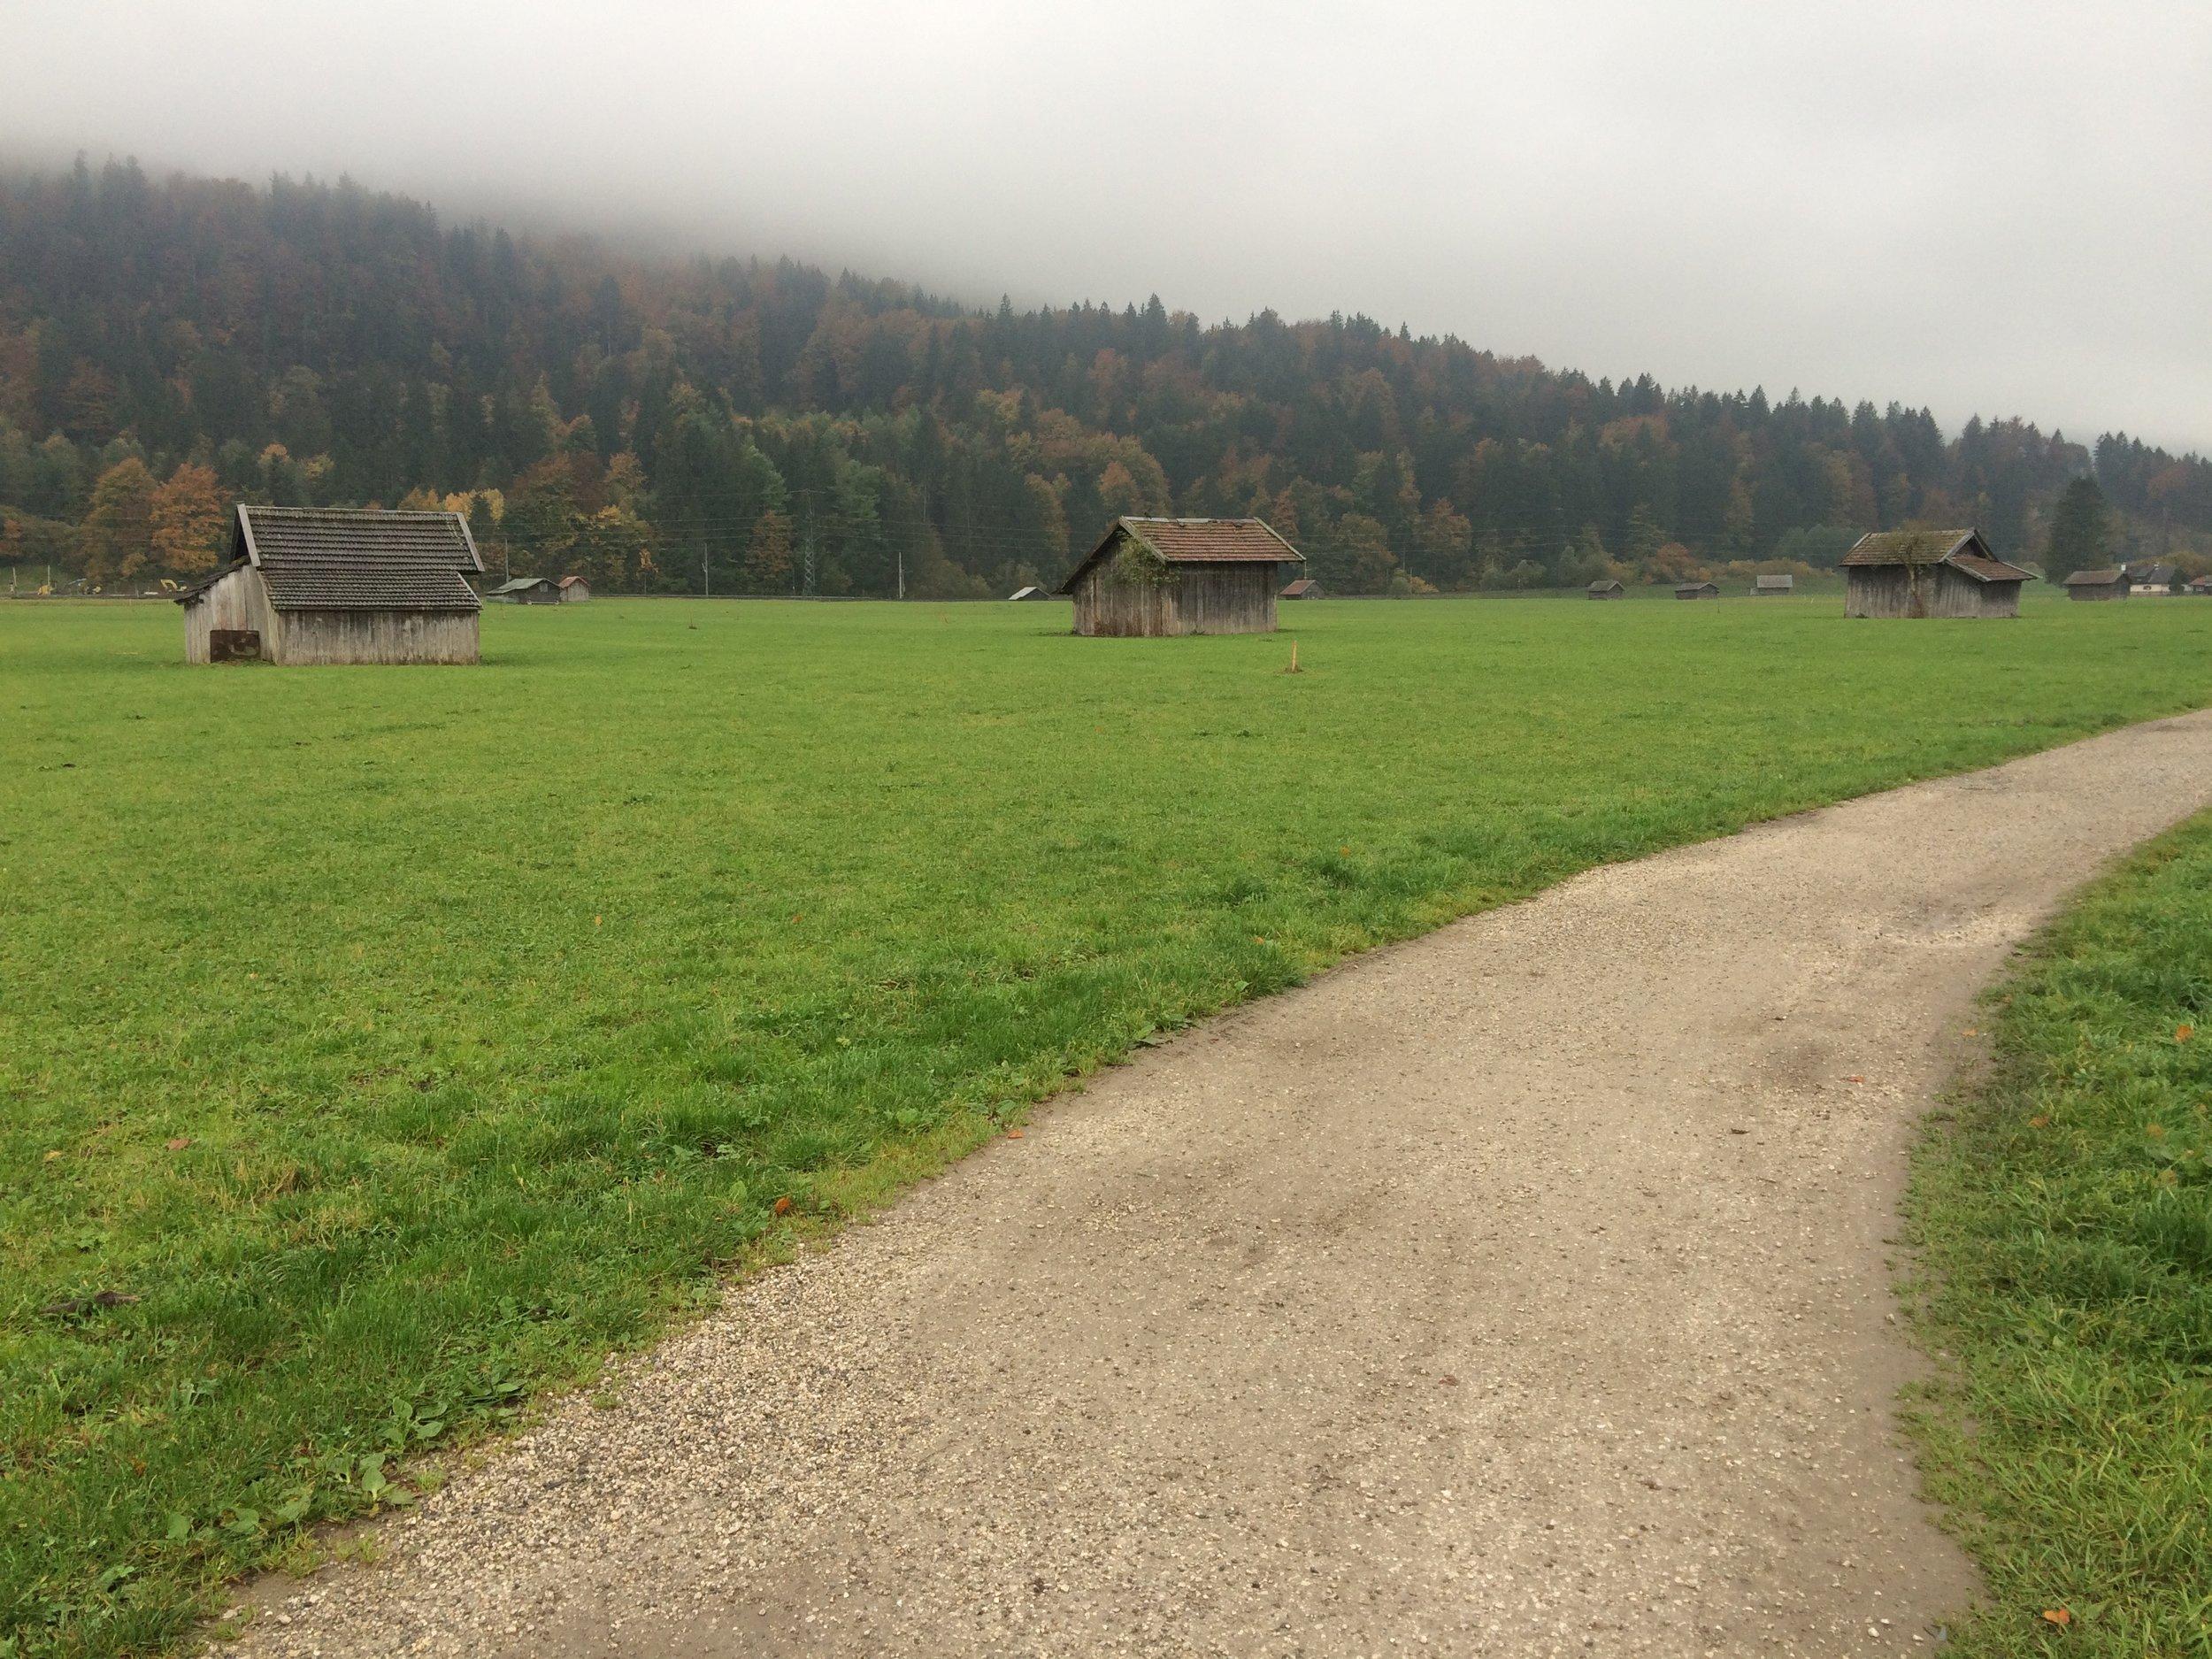 Garmisch-Partenkirchen, Germany --October 2015